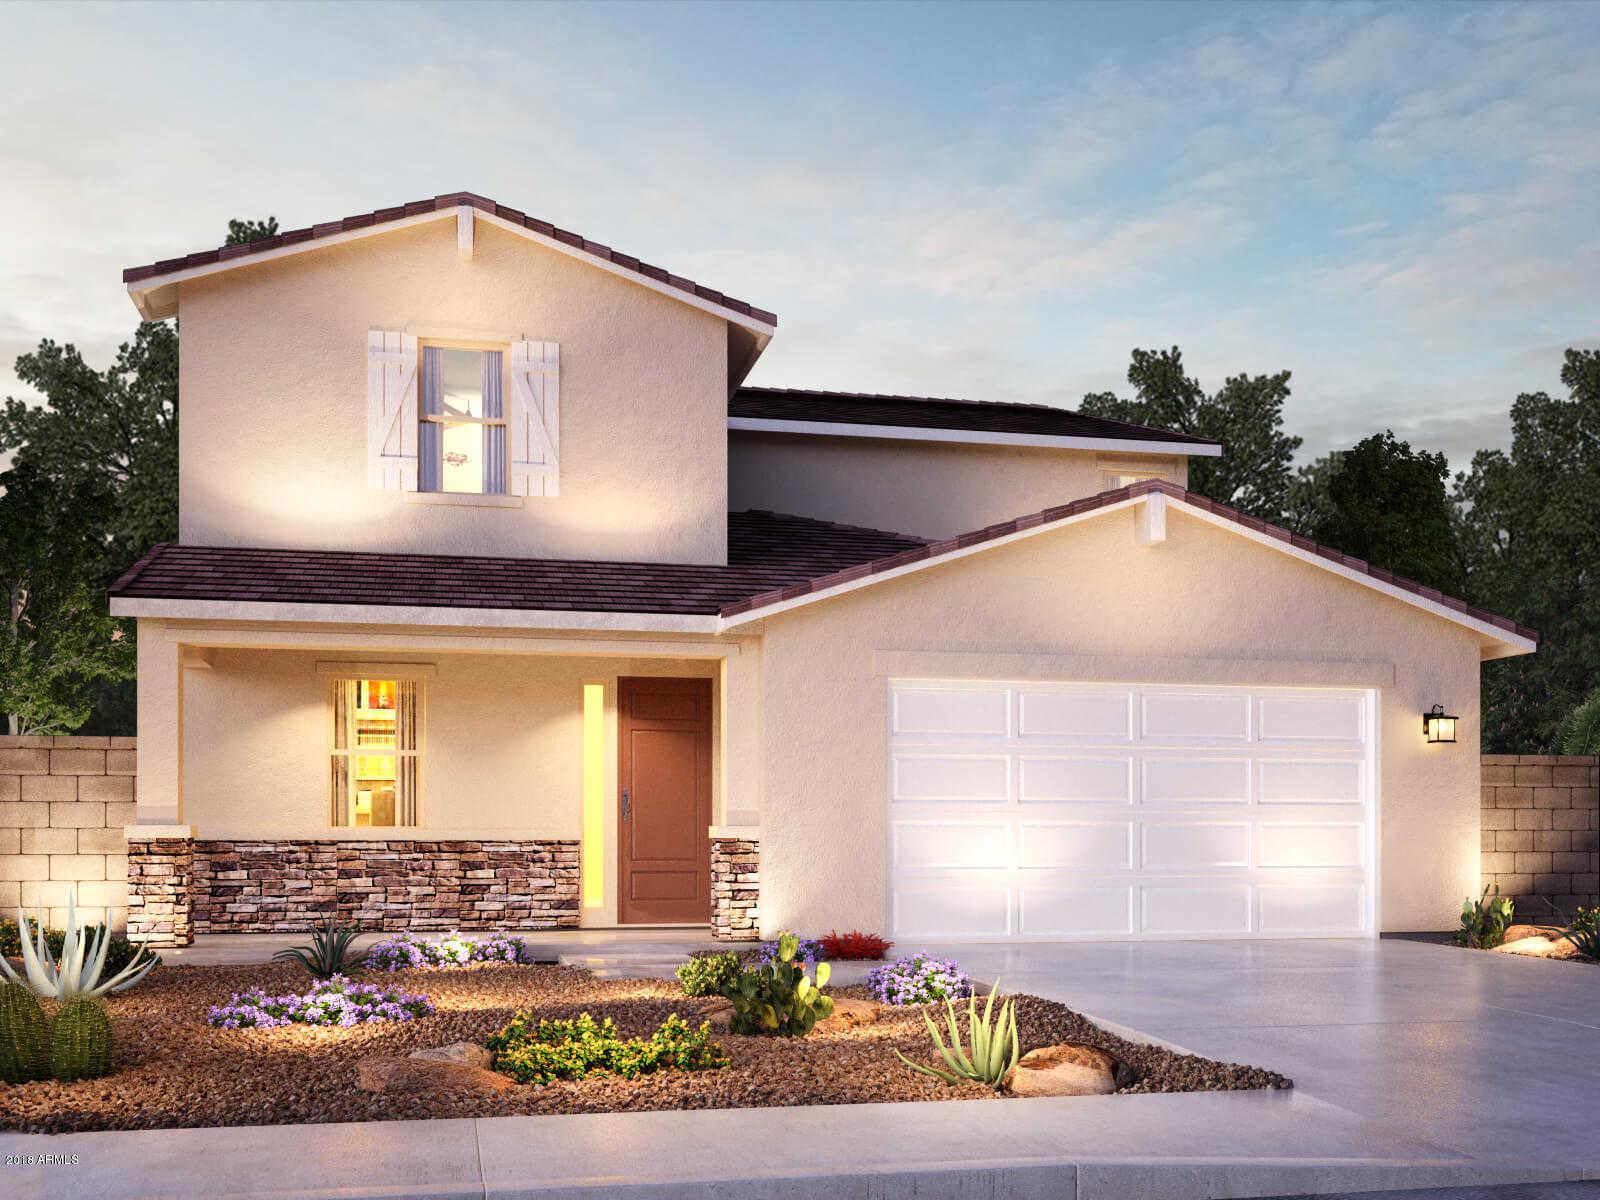 $322,495 - 5Br/3Ba - Home for Sale in Marbella Ranch Parcel 1, Glendale